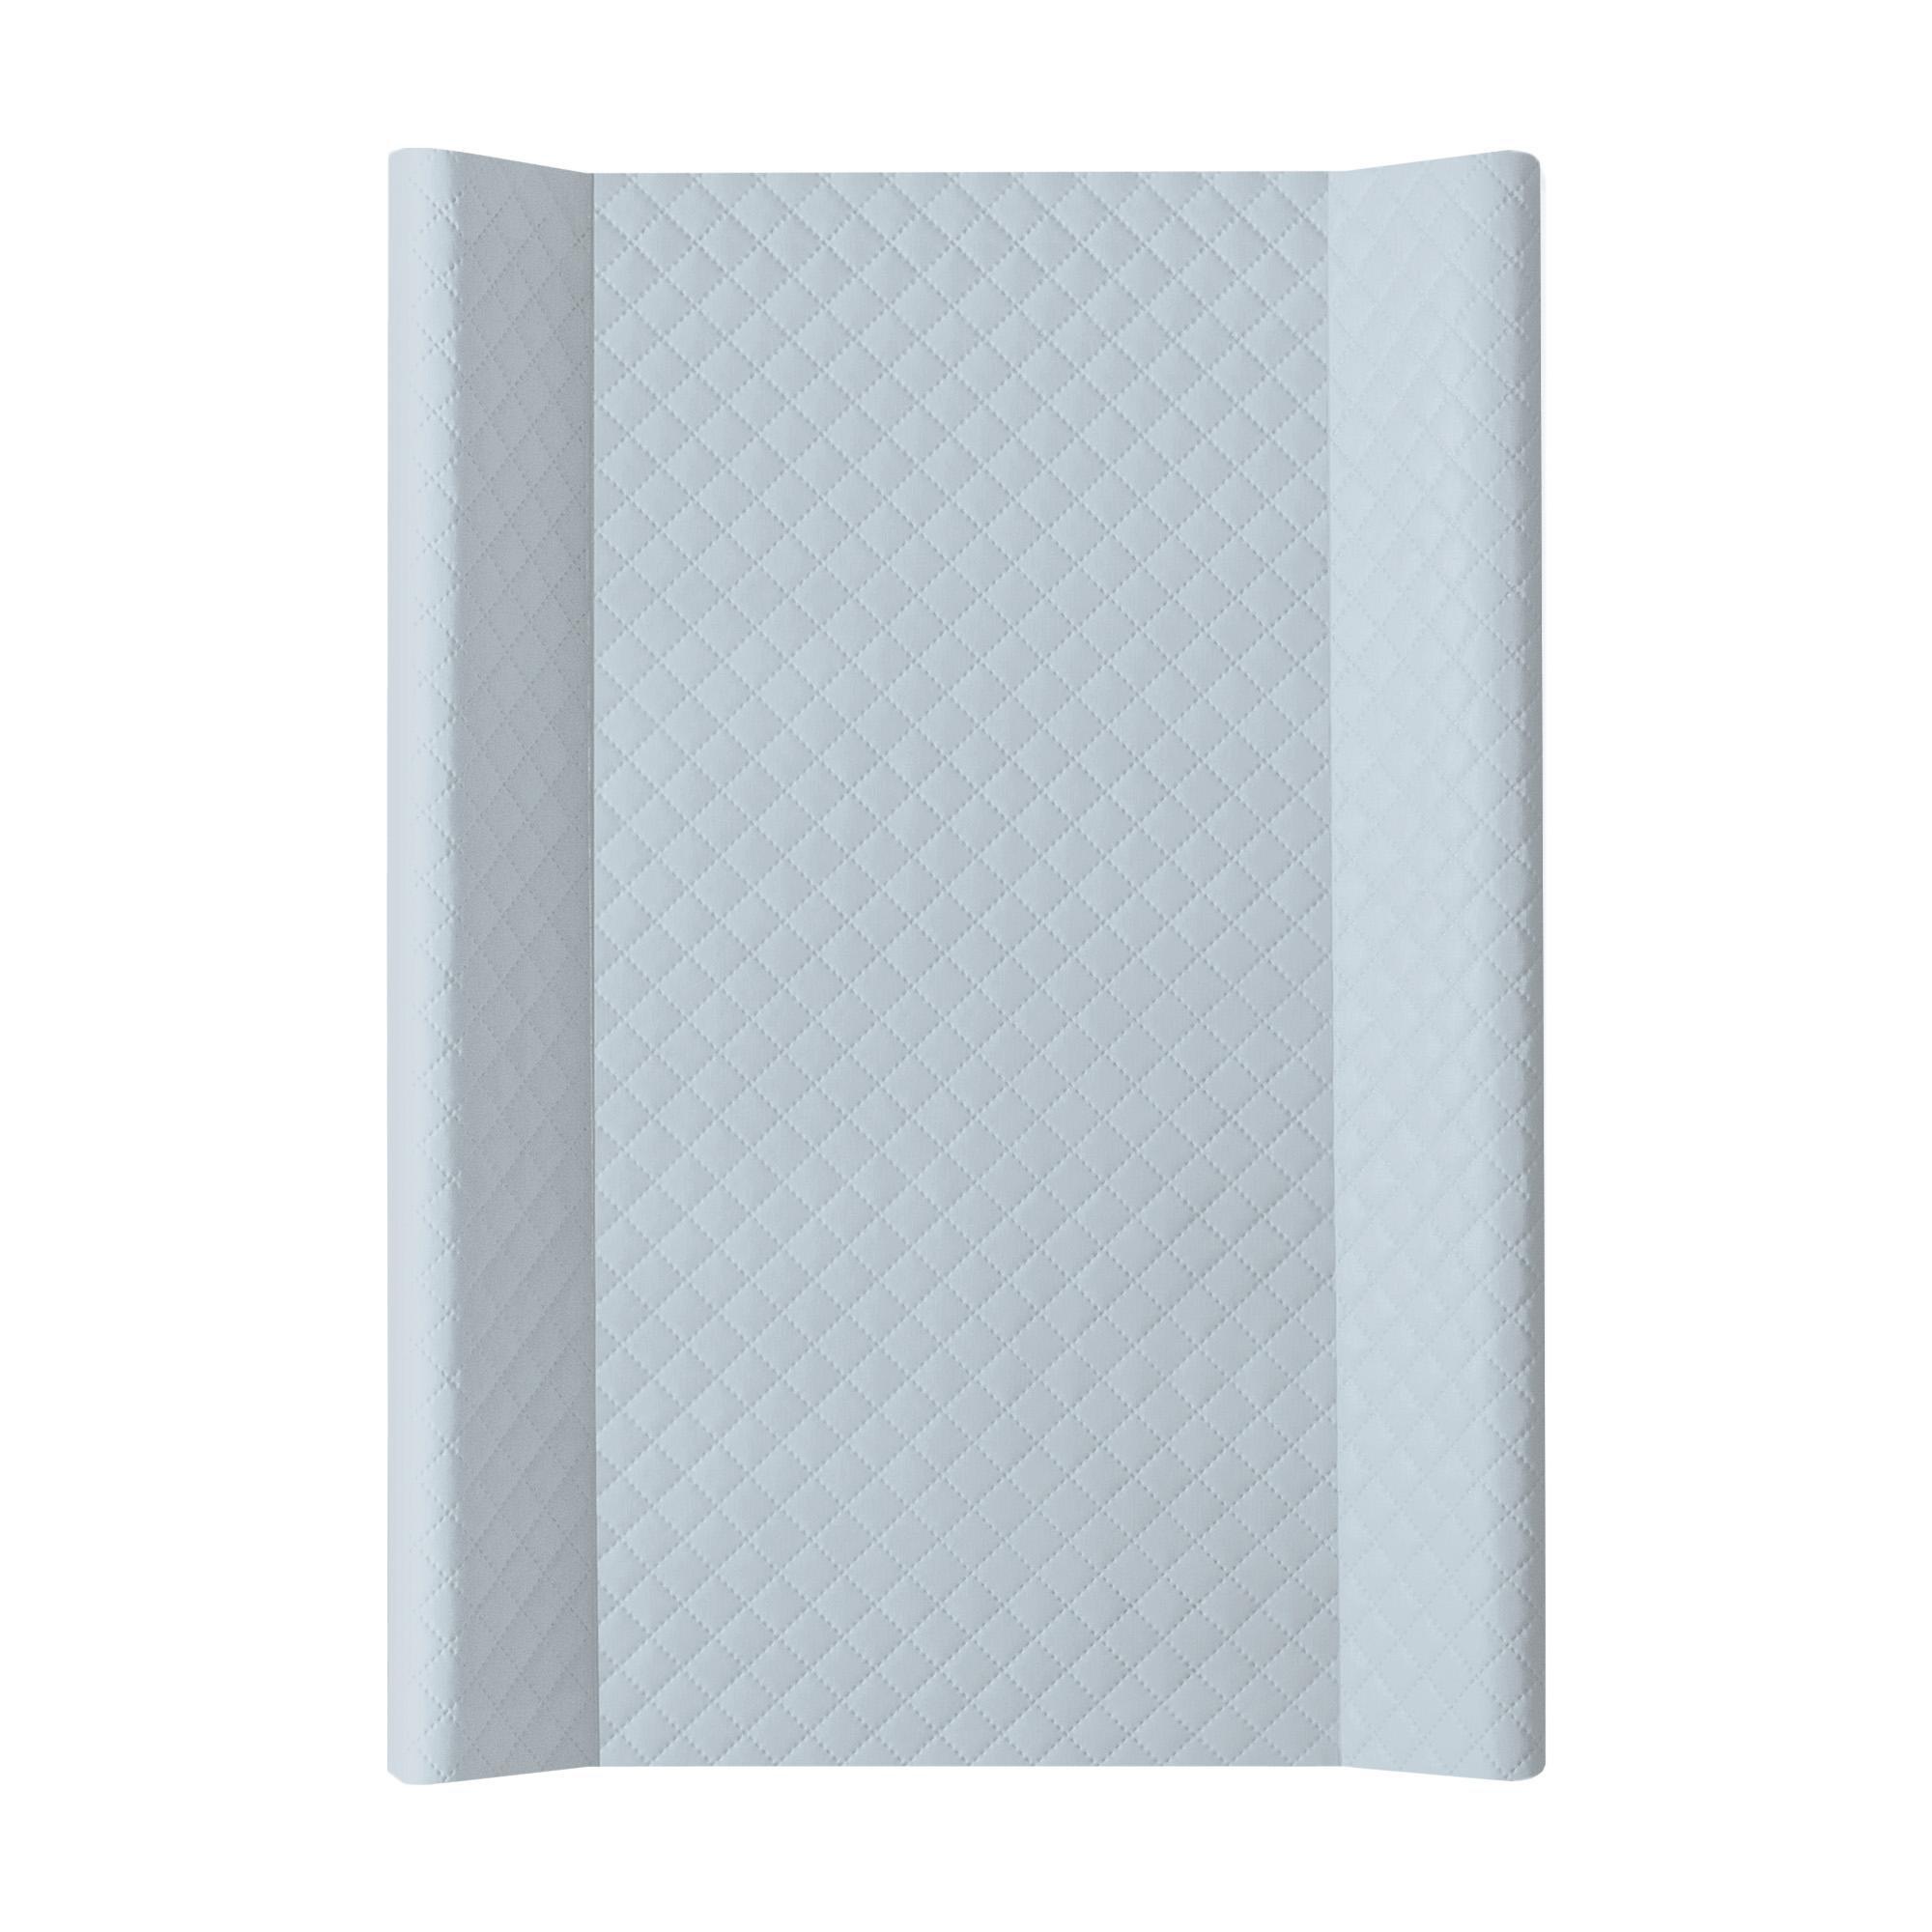 Pøebalovací podložka tvrdá Caro Steel 50x70cm - zvìtšit obrázek